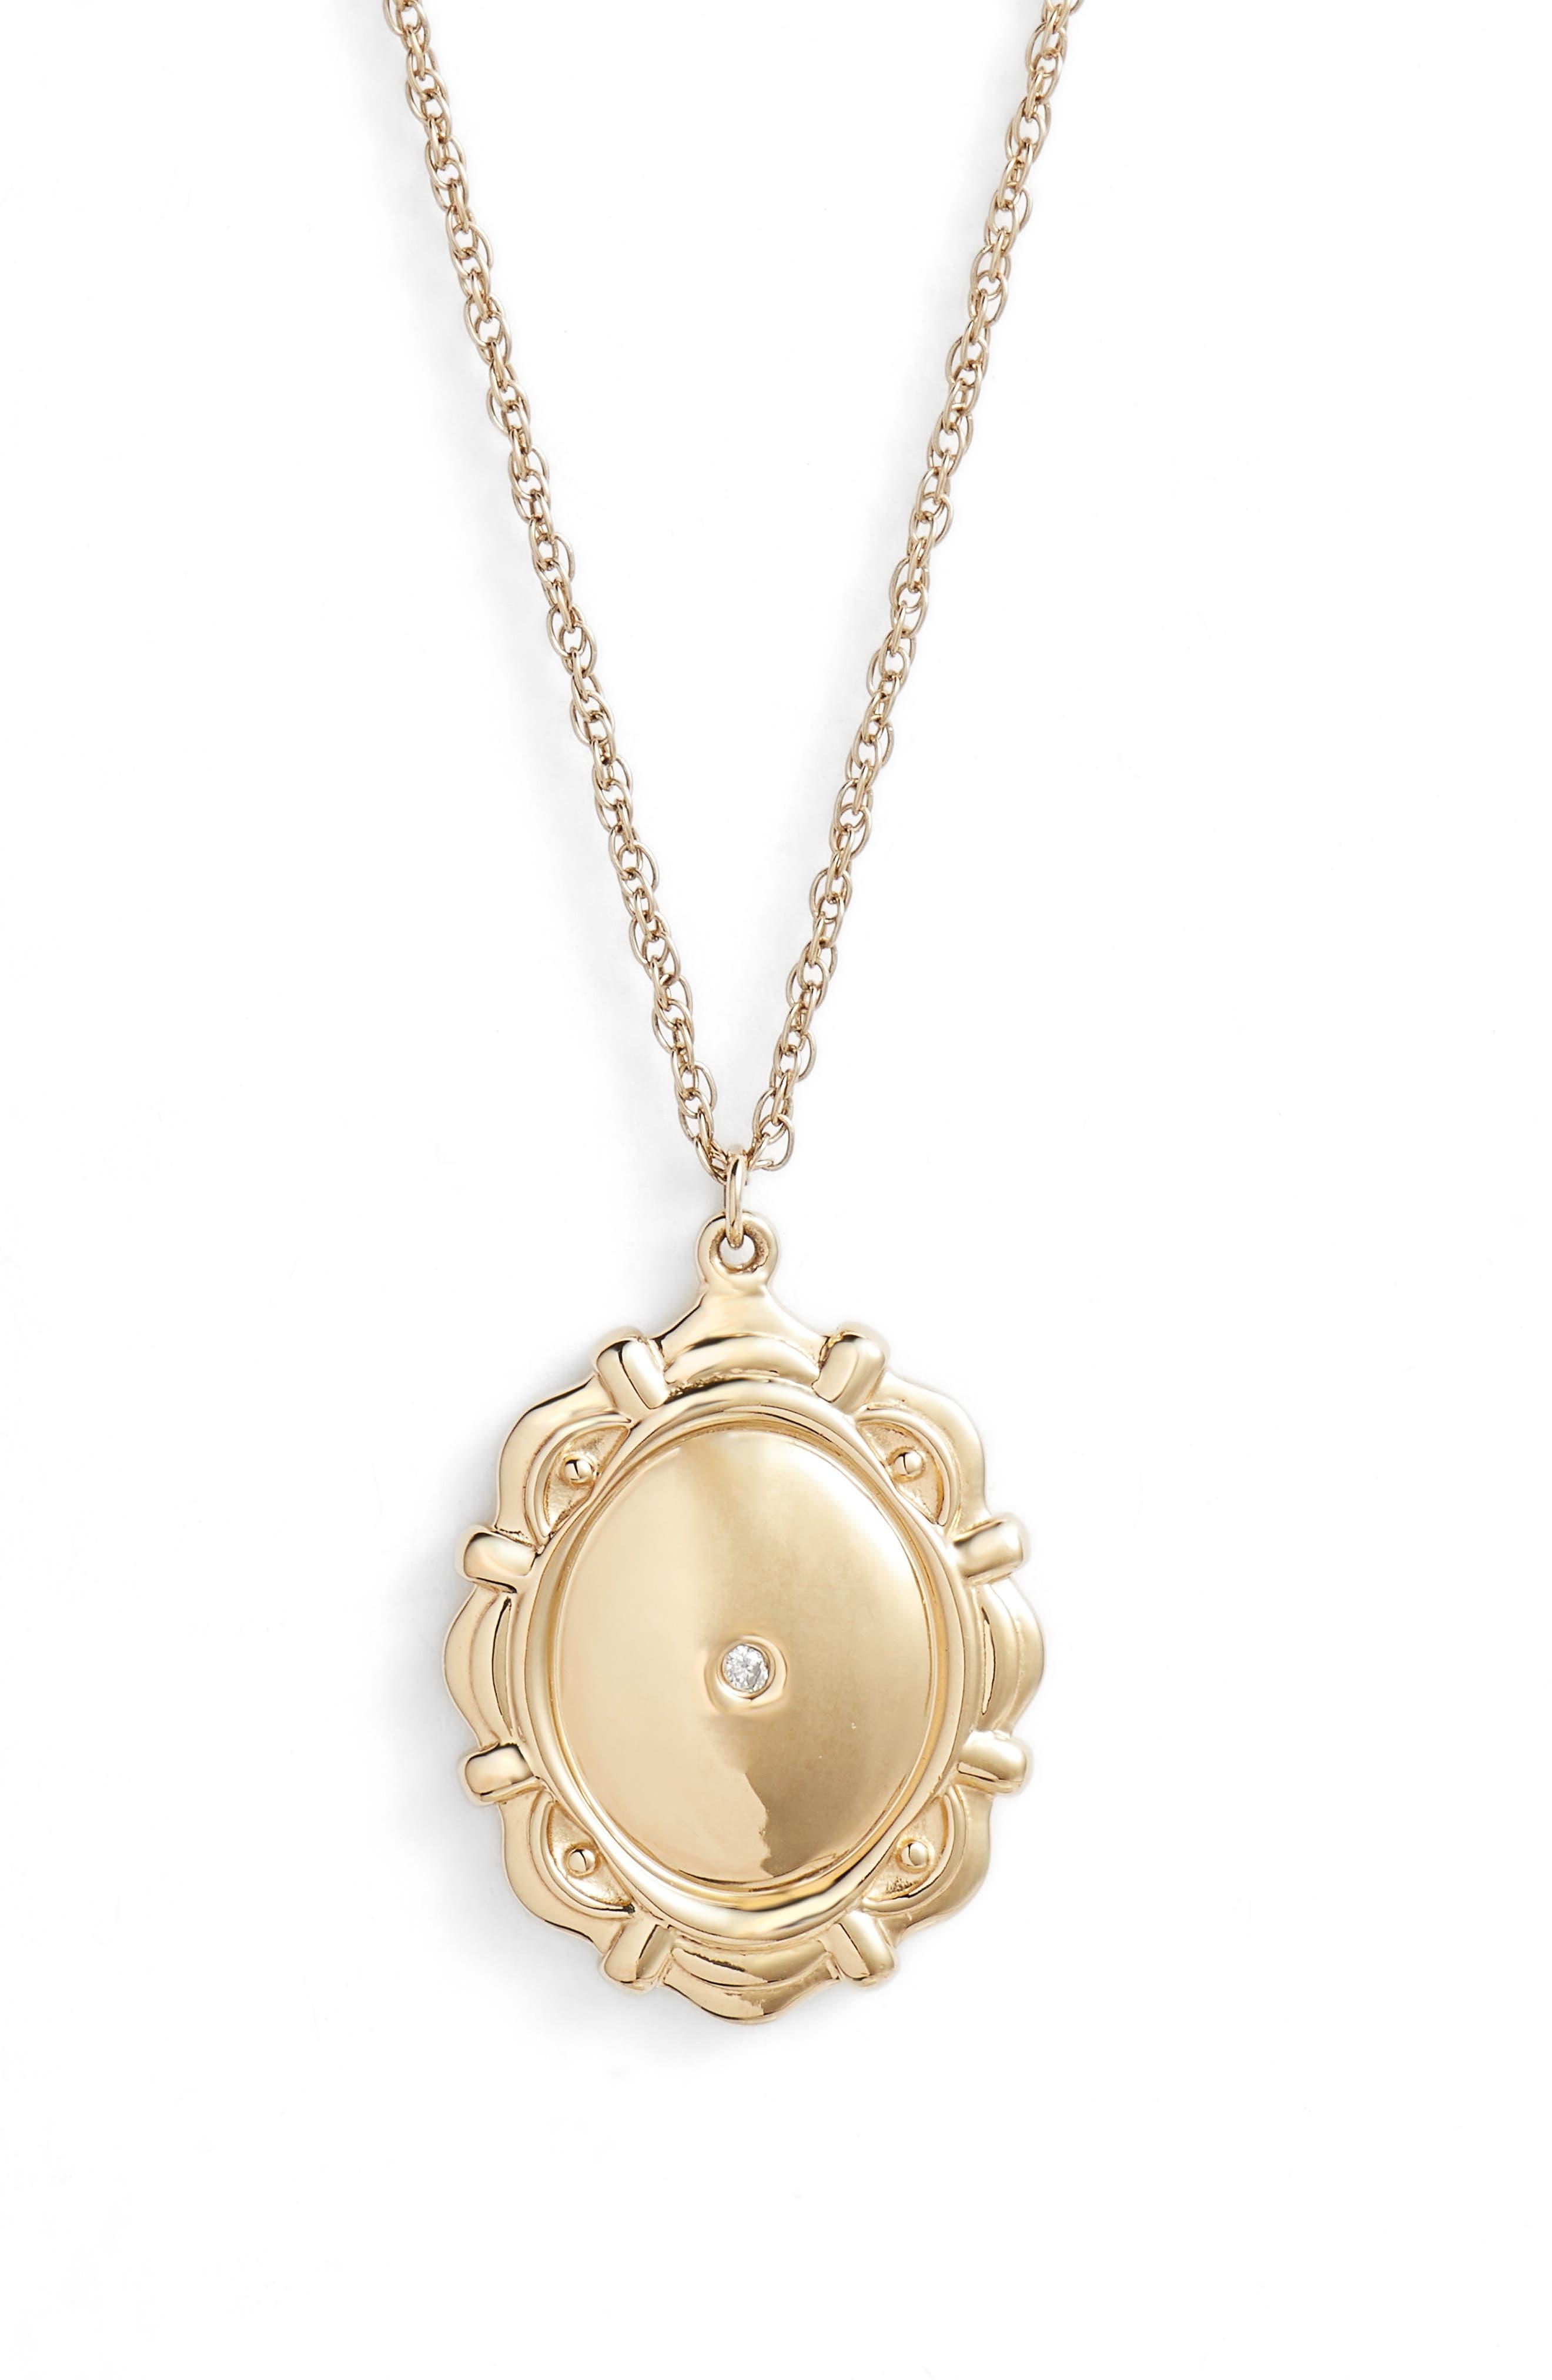 Zuri Medallion Diamond Pendant Necklace,                             Main thumbnail 1, color,                             YELLOW VERMEIL